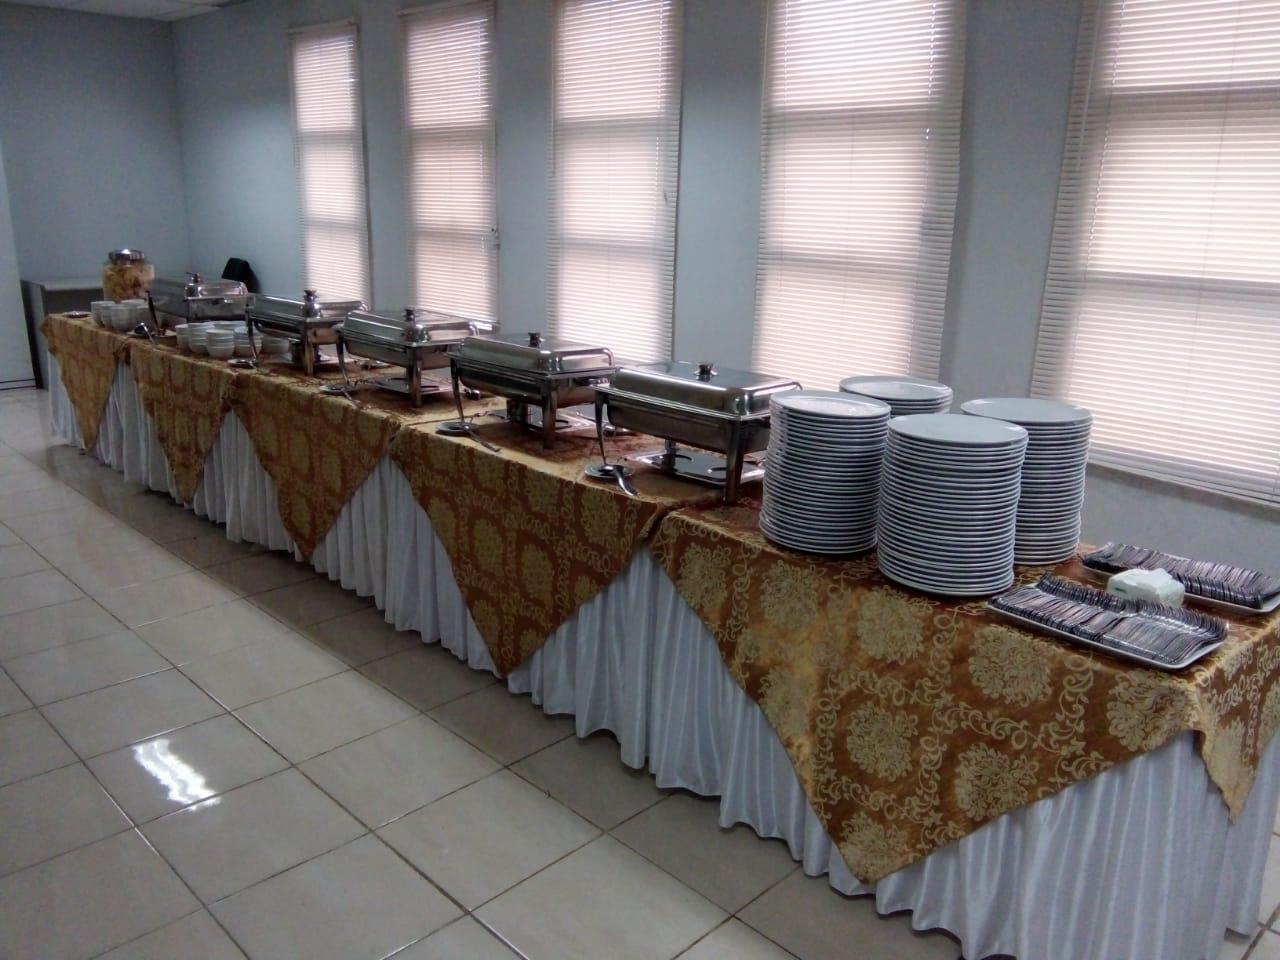 Catering Prasmanan Bendungan Hilir Tanah Abang Jakarta Pusat